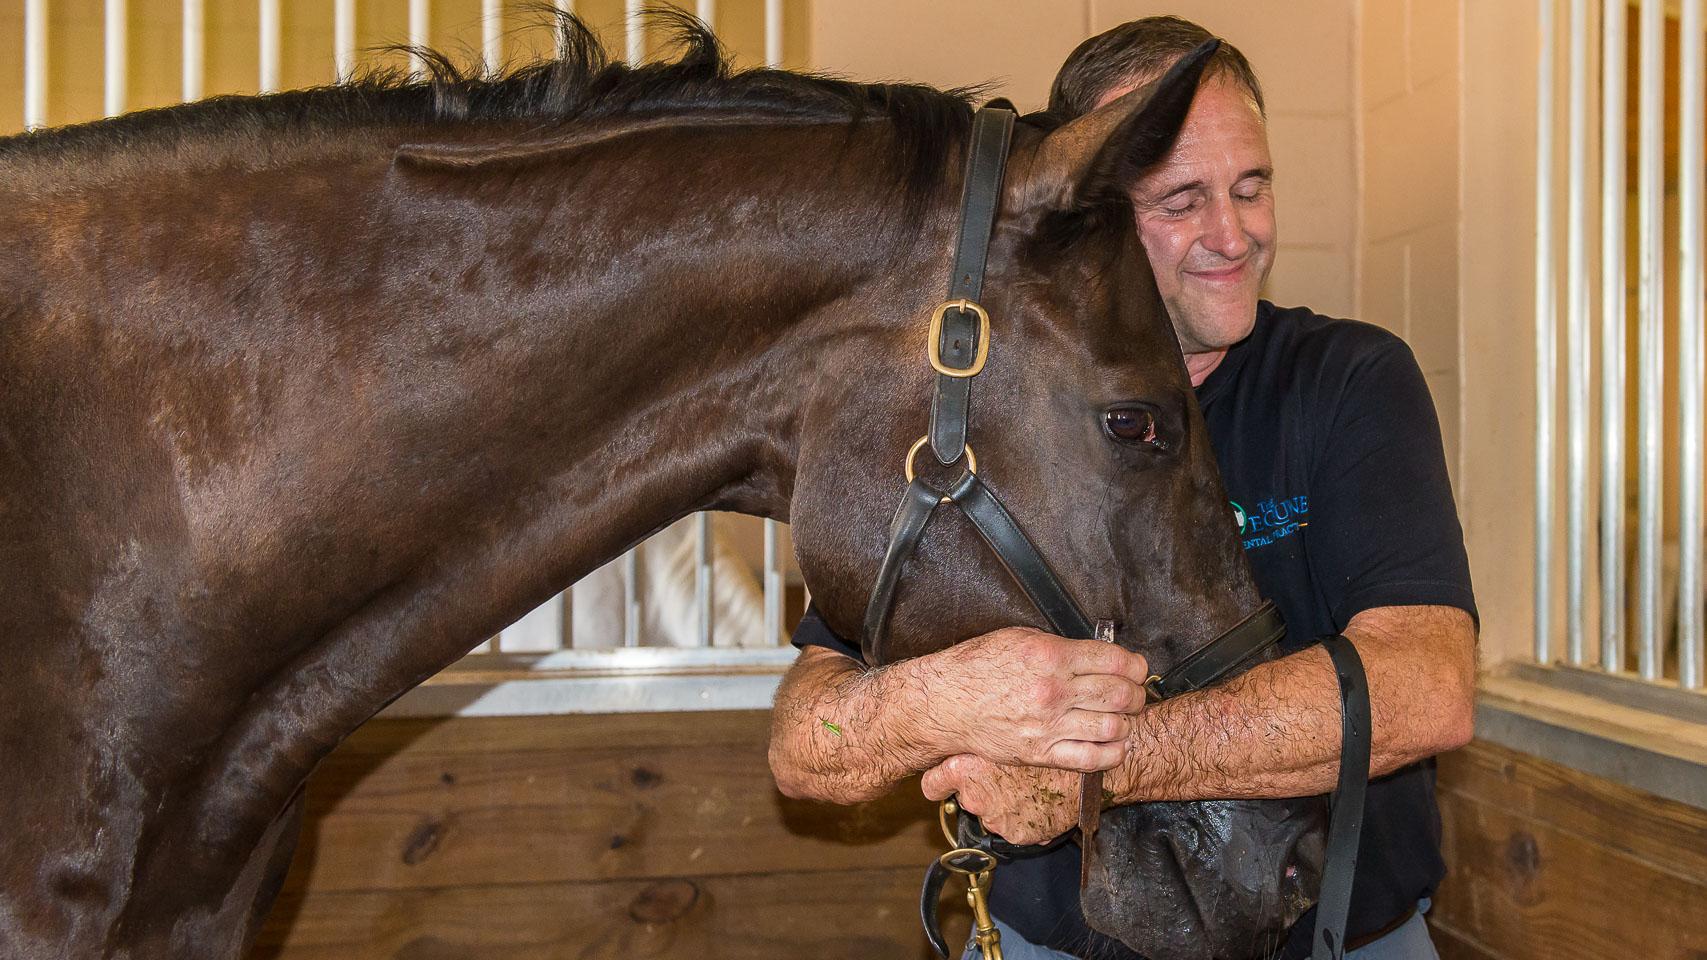 Horsemanship Dentistry, The Equine Practice Inc, Geoff Tucker DVM, Melissa Buday